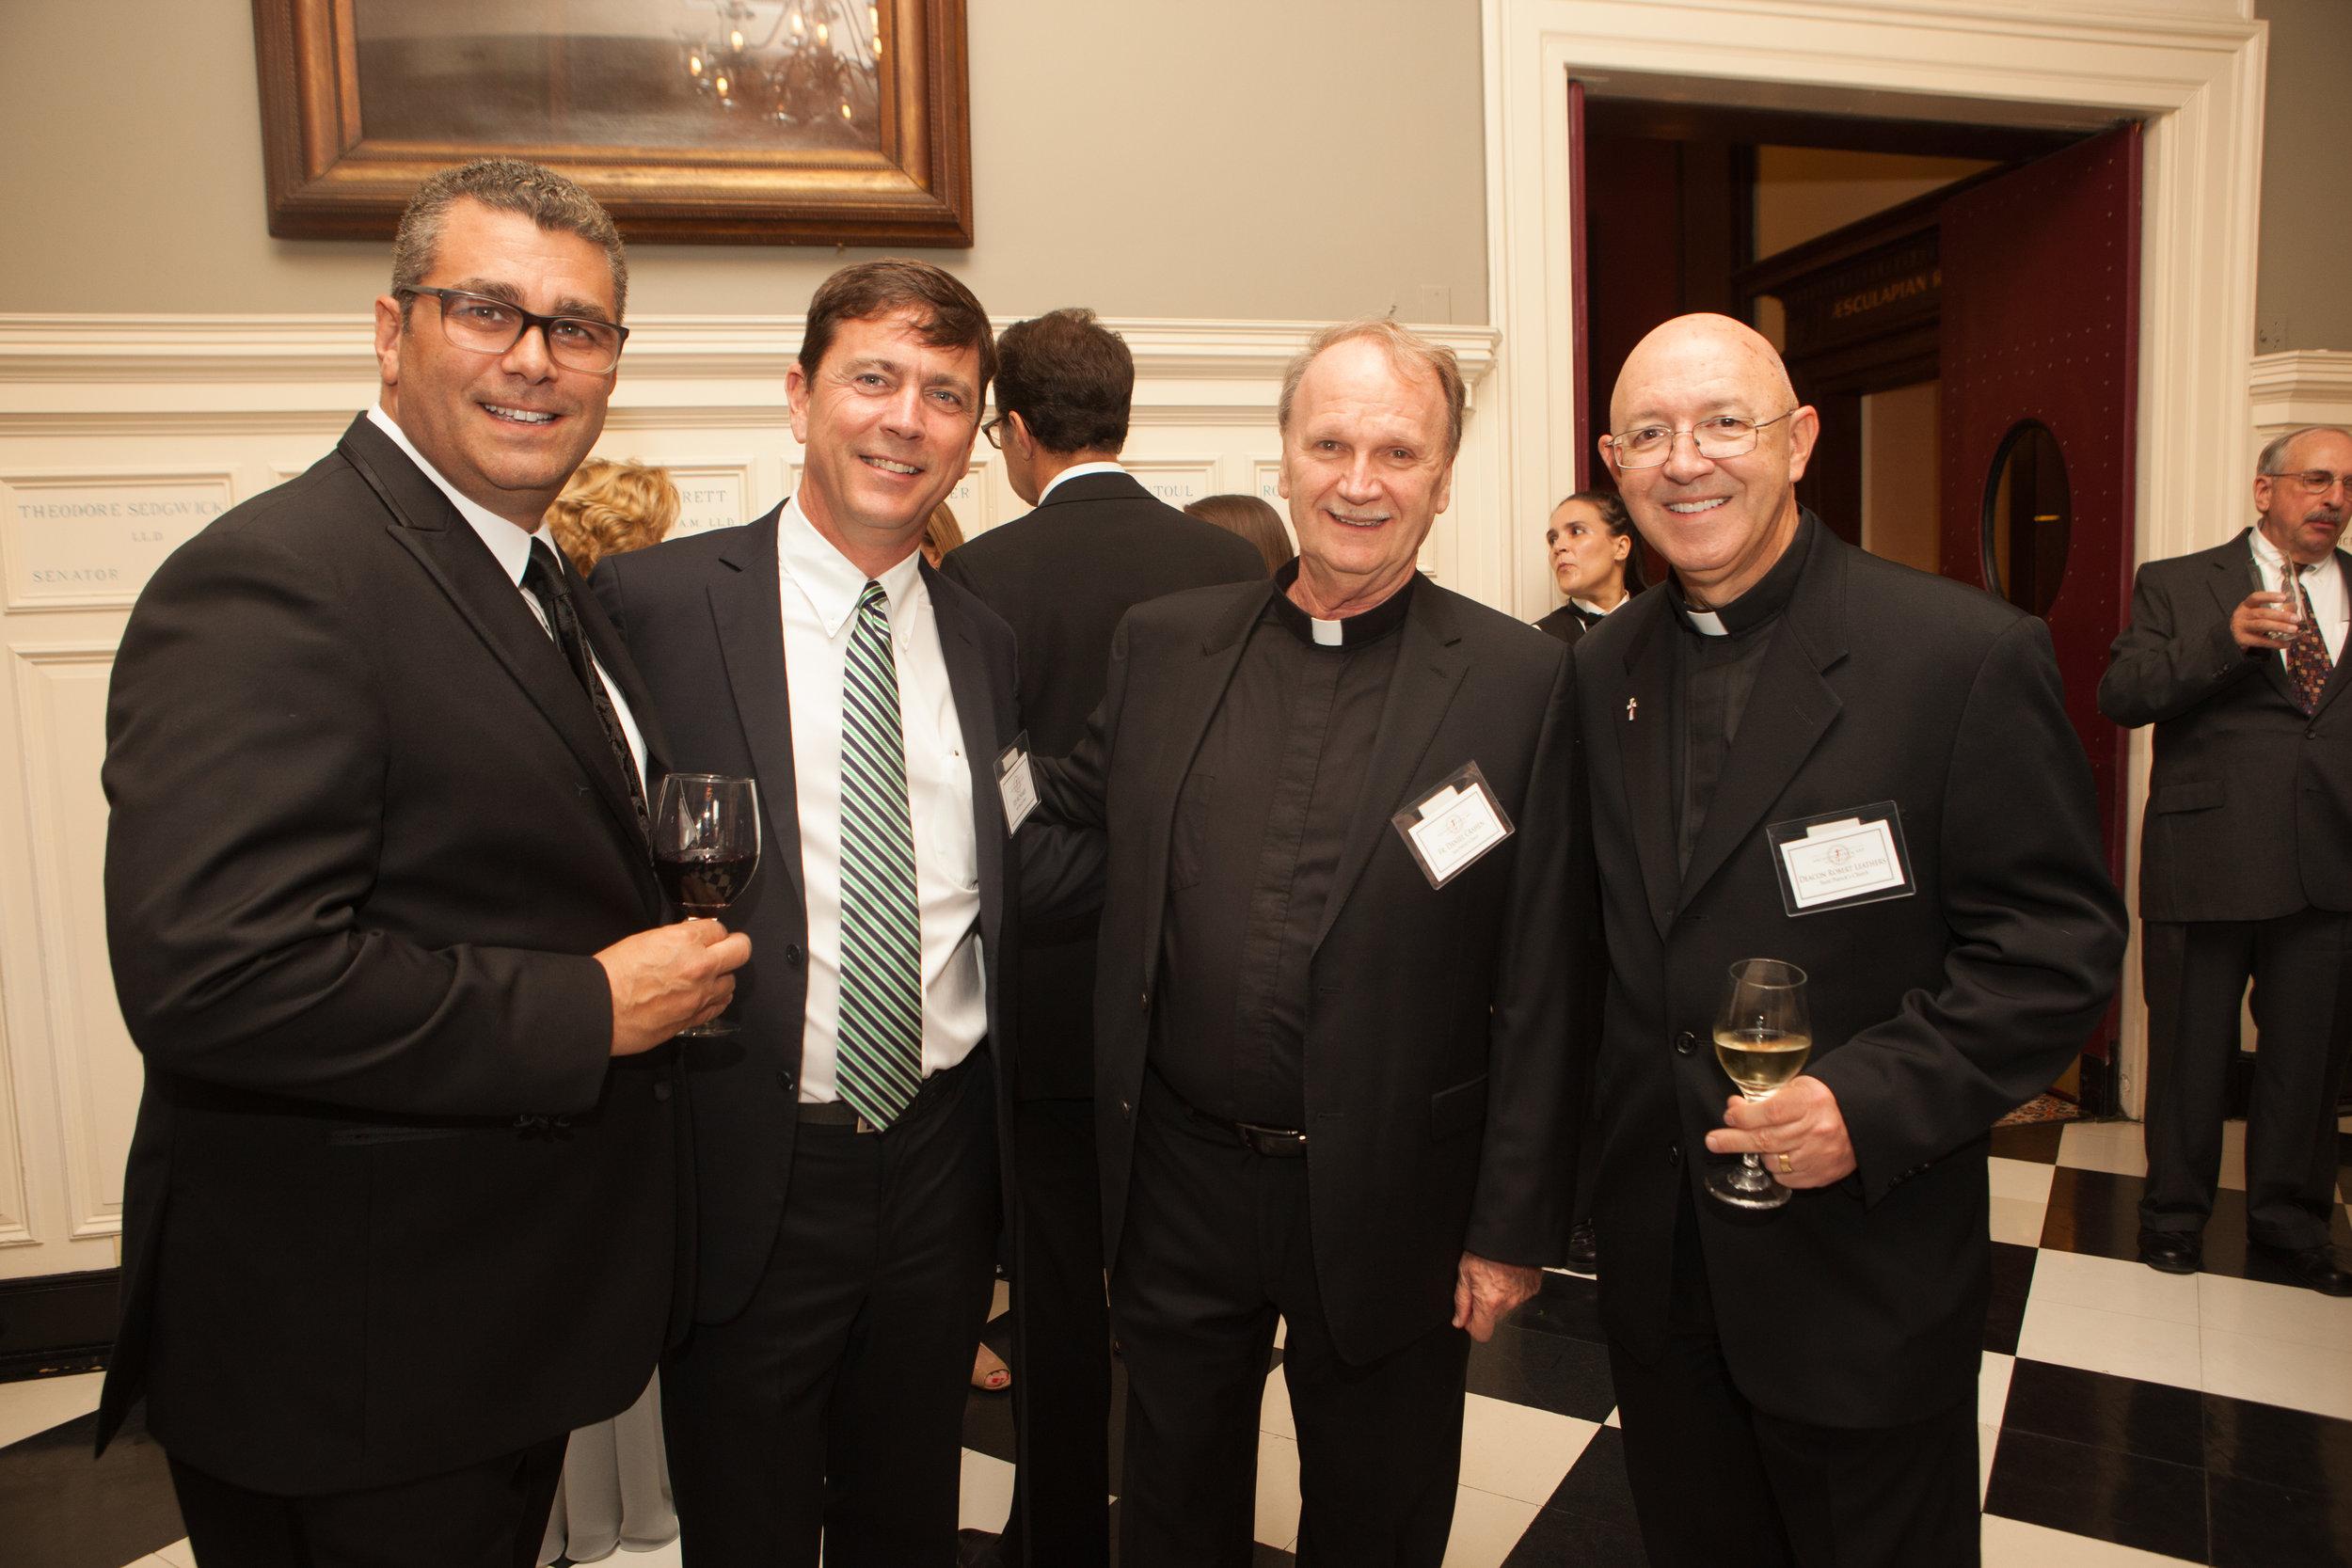 David Riccio, Joe McNamee, Fr. Daniel Crahen, Deacon Robert Leathers